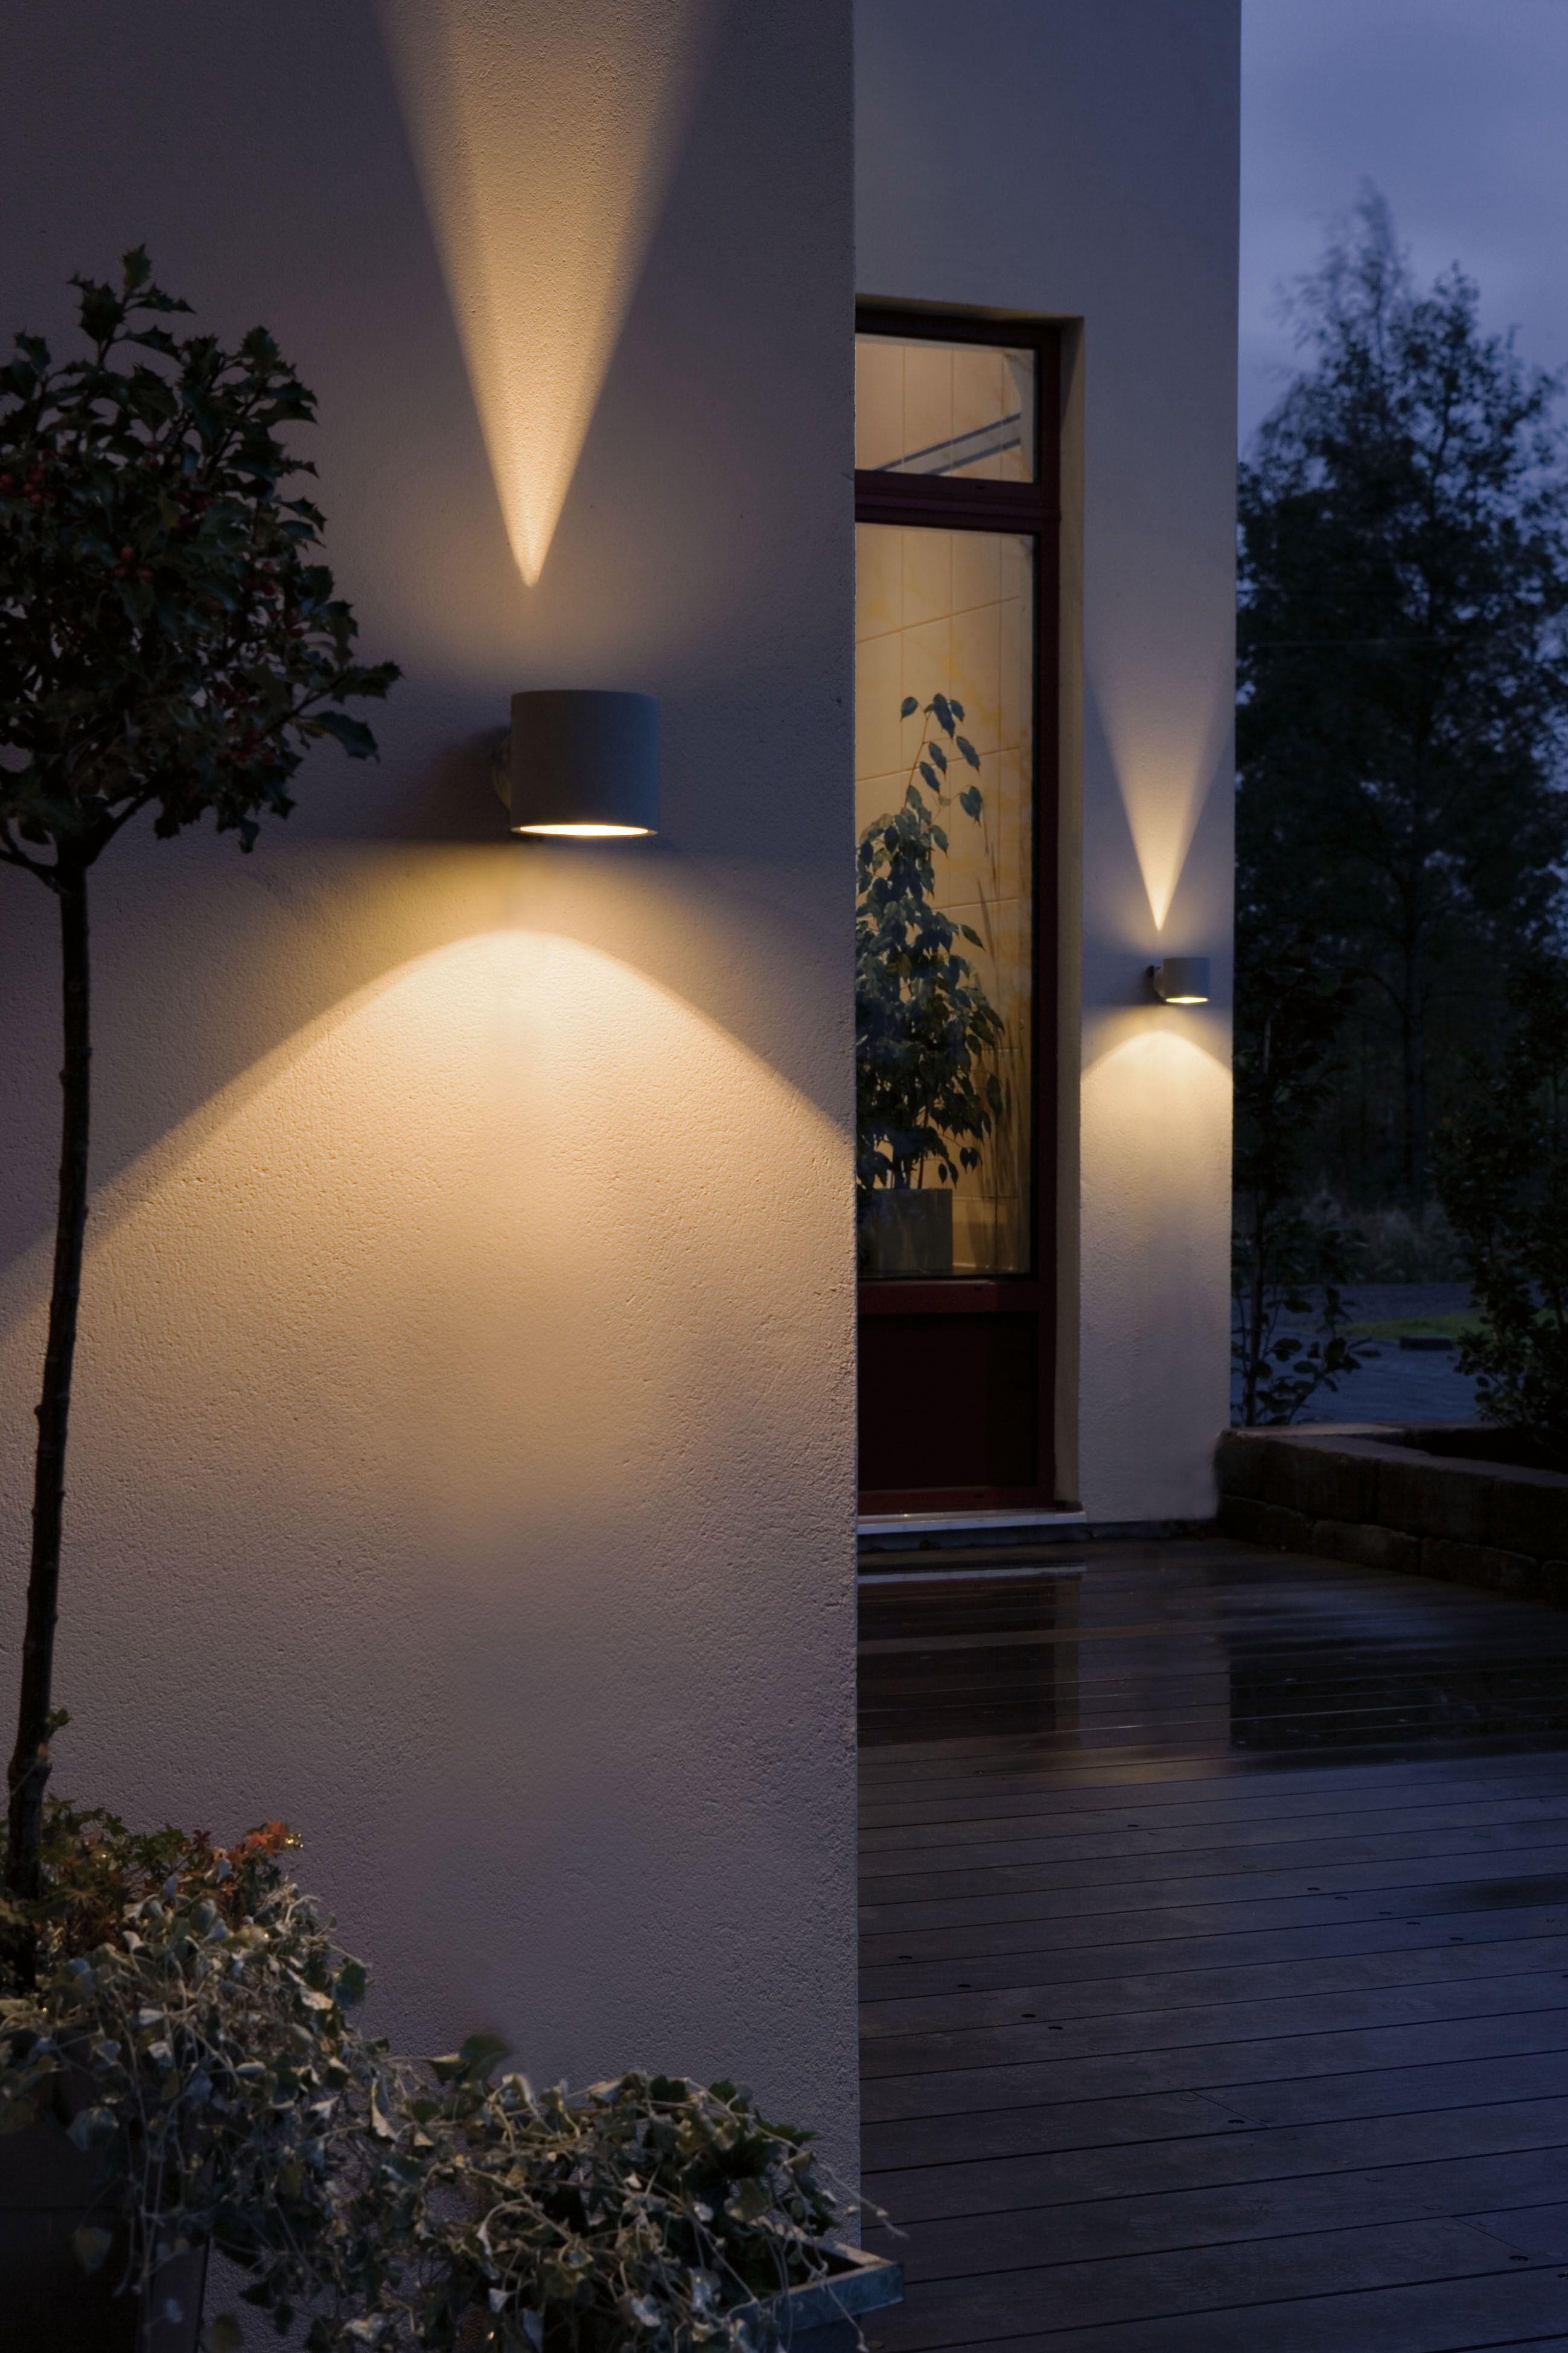 Ulkovalot Eclairage Piscine Eclairage Exterieur Terrasse Eclairage De La Facade